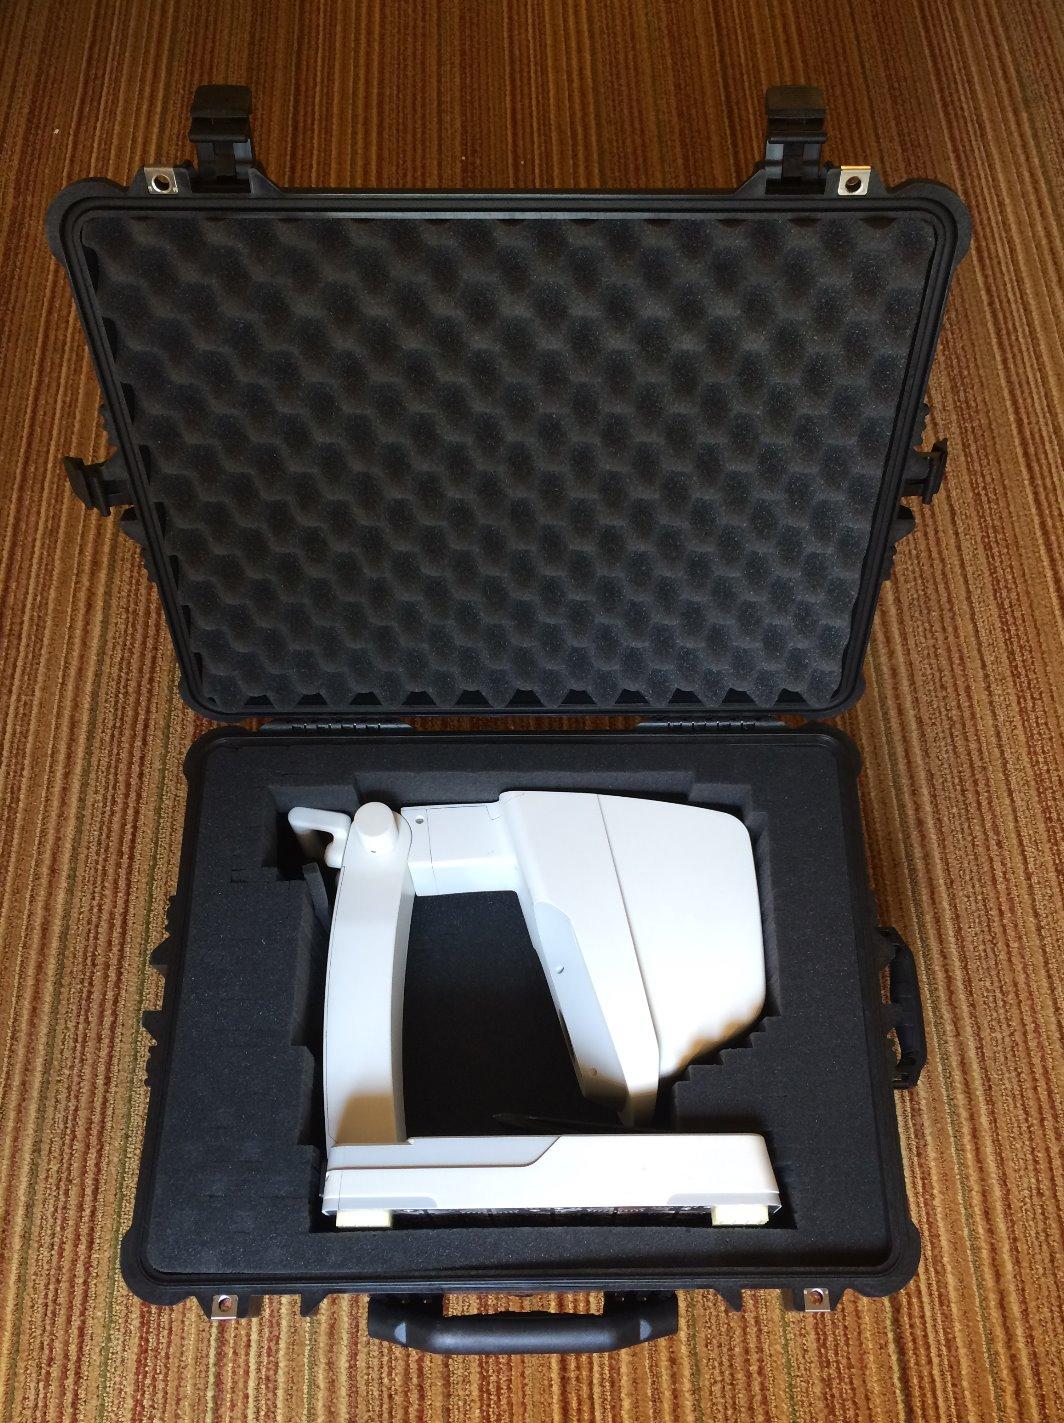 PortableX inside Suitcase